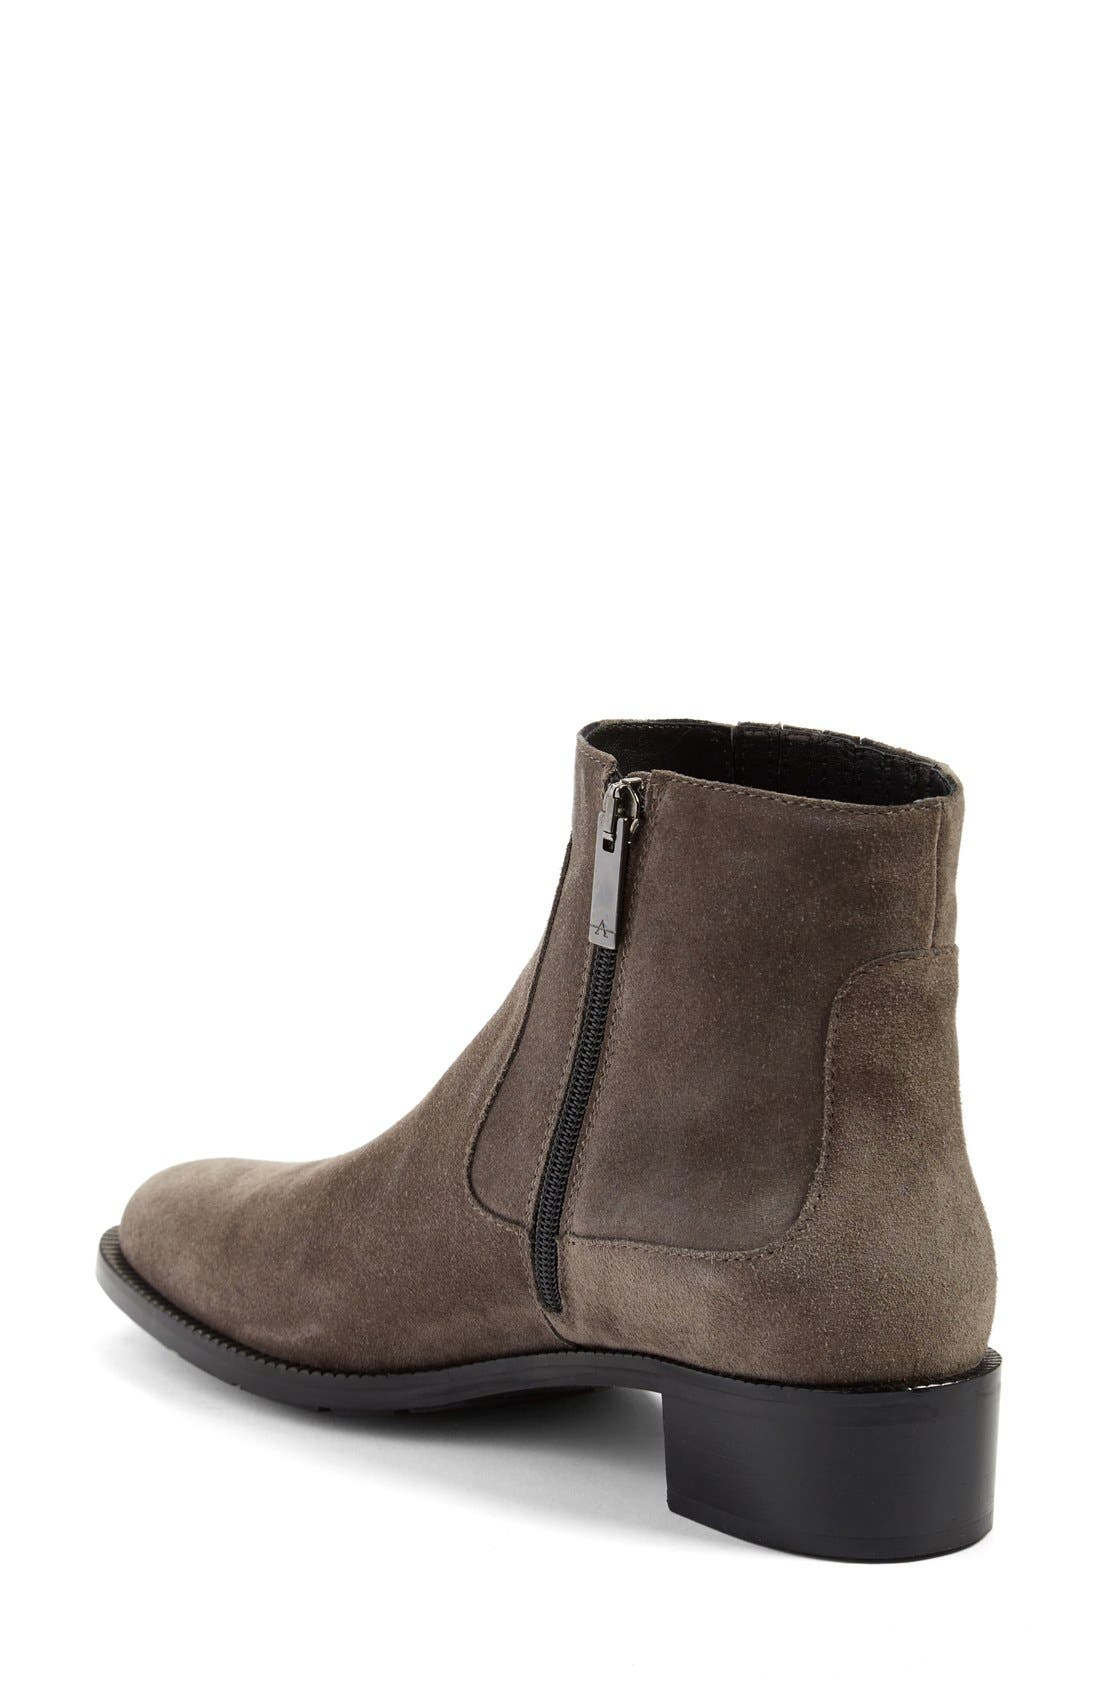 Alternate Image 2  - Aquatalia 'Oribella' Weatherproof Leather Bootie (Women)